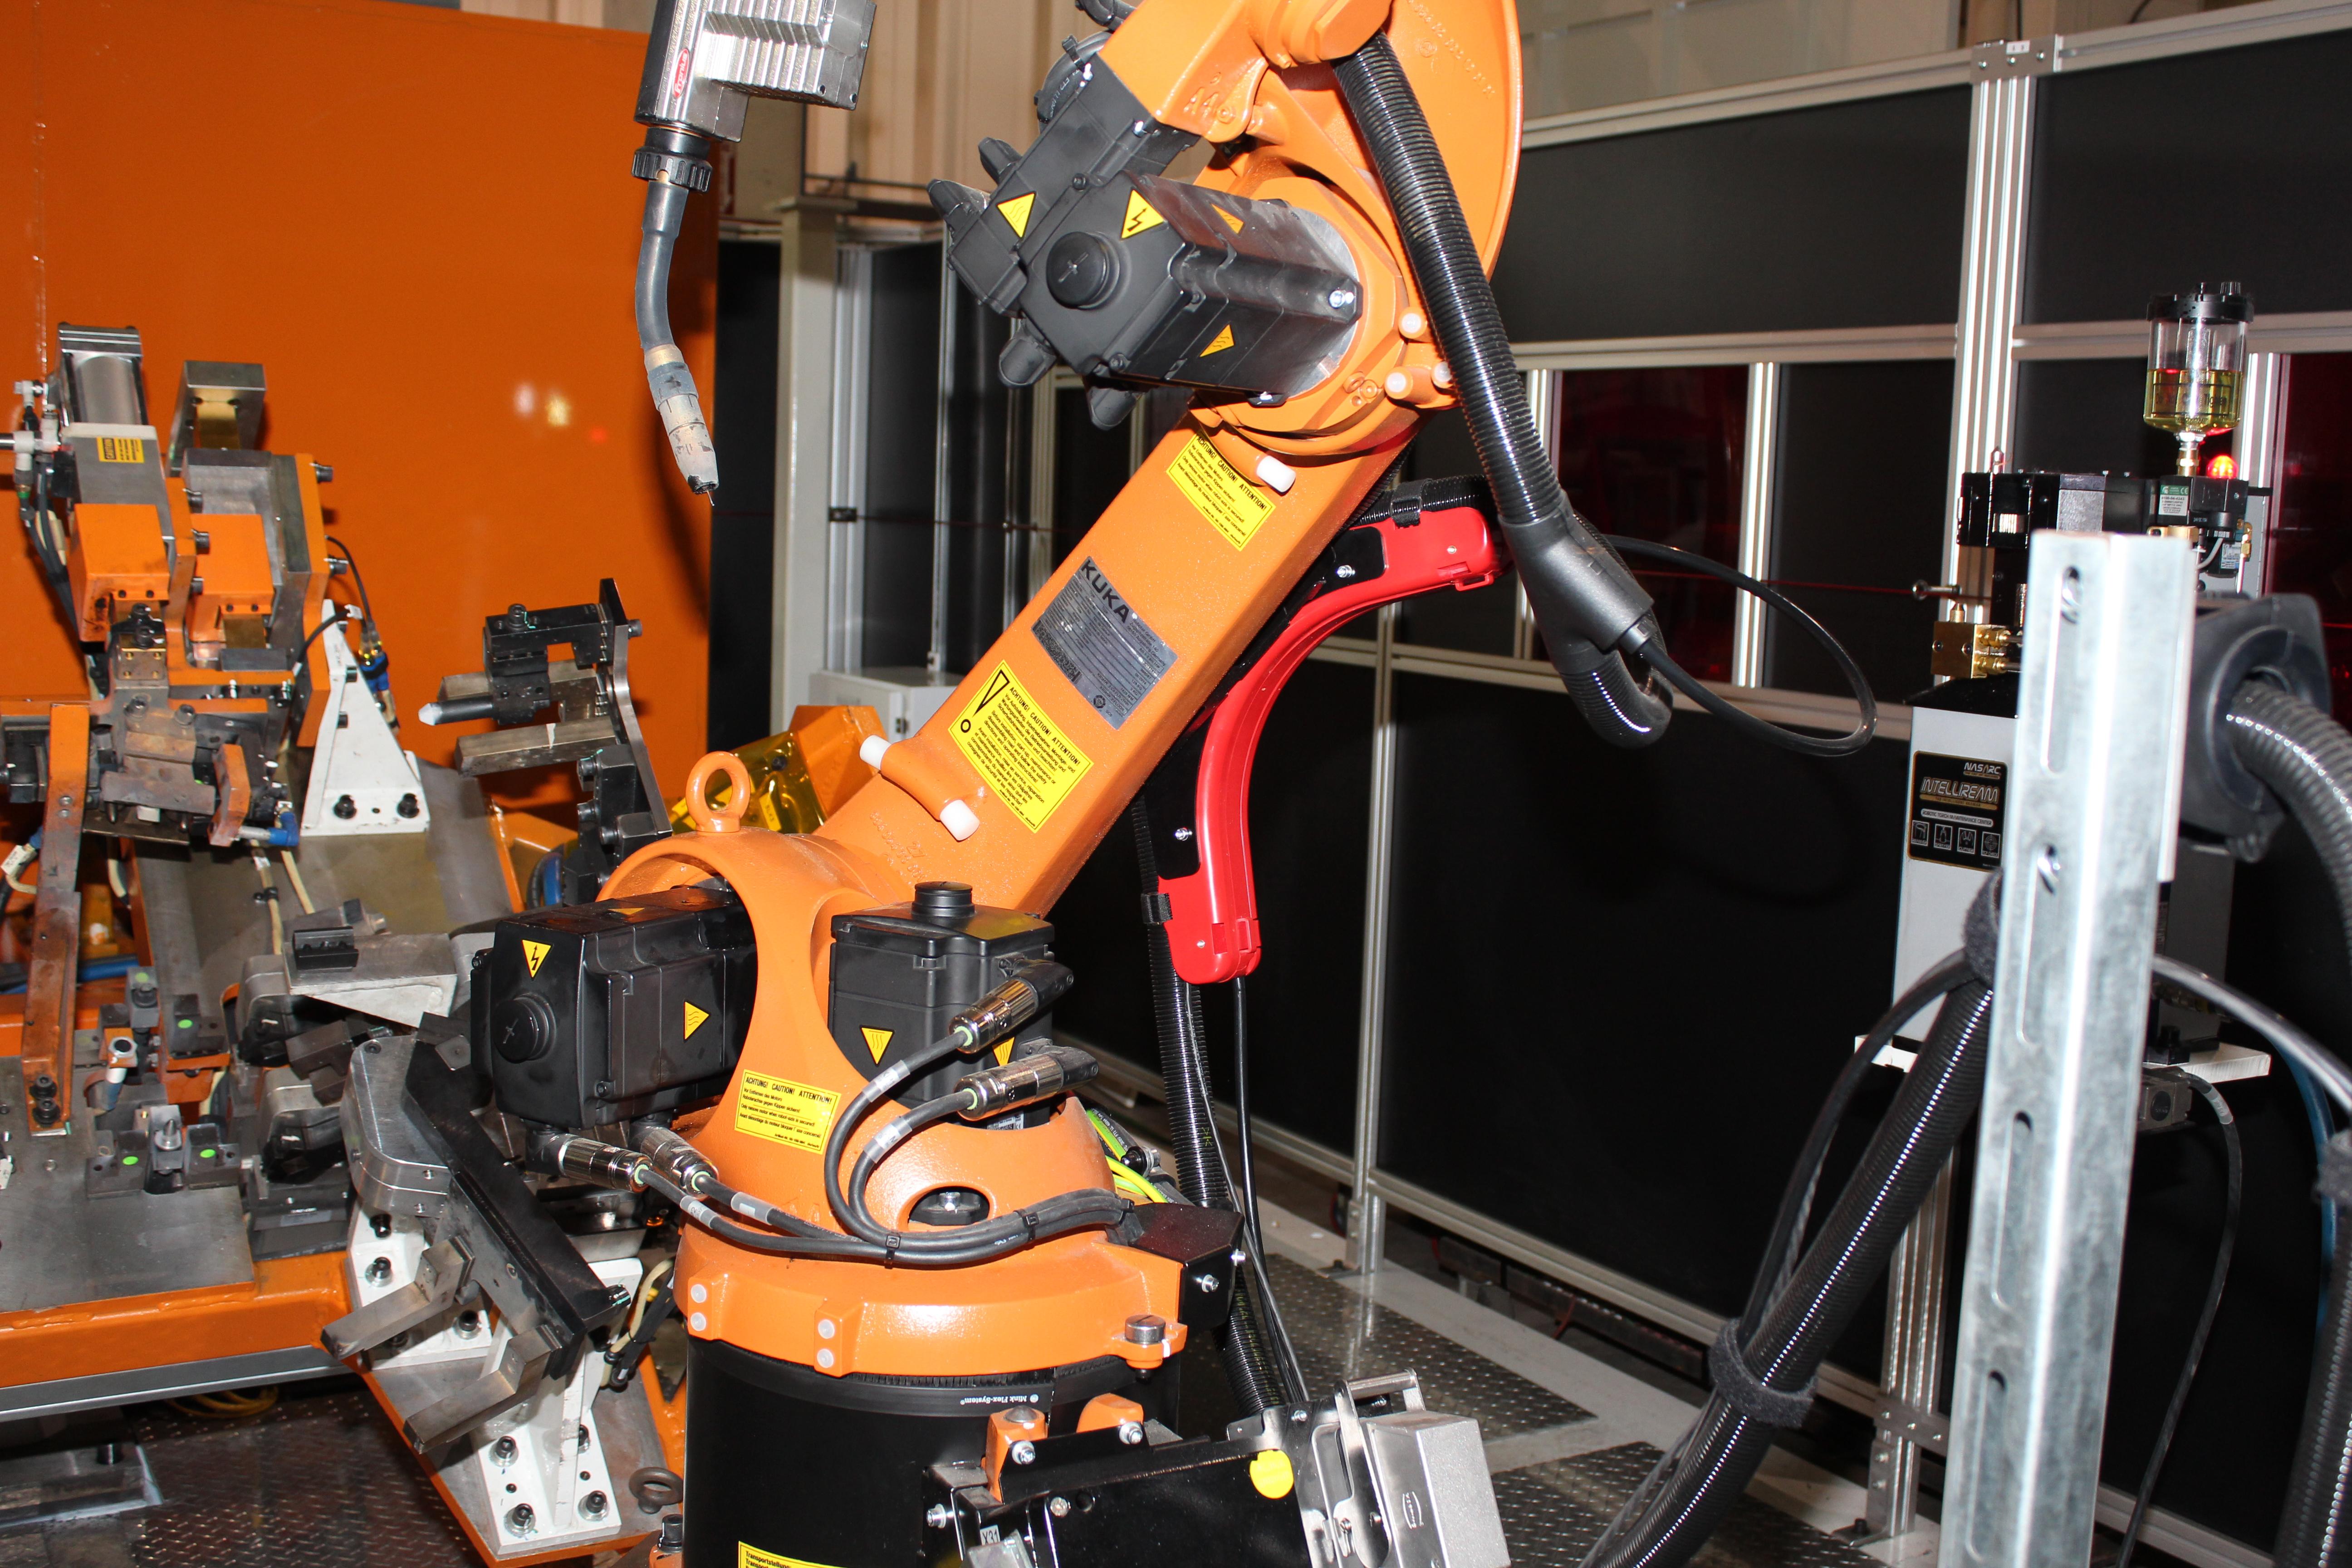 Robotic Welding + Robot + Automated Welding + Fori